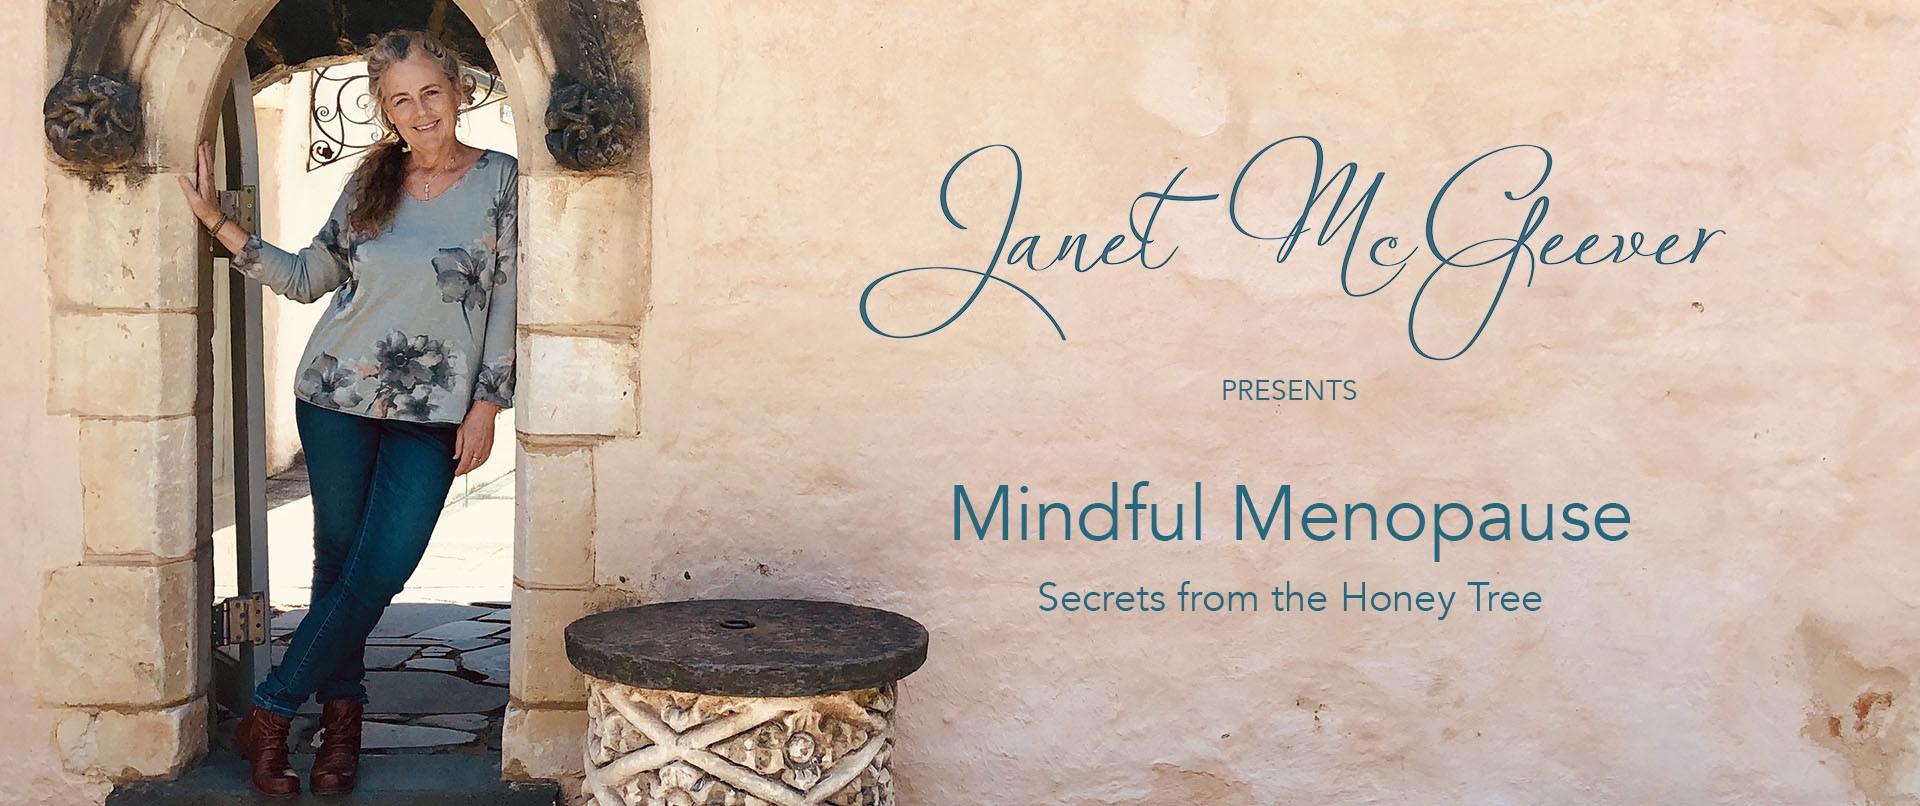 Janet McGeever presents Art of Feminine Presence